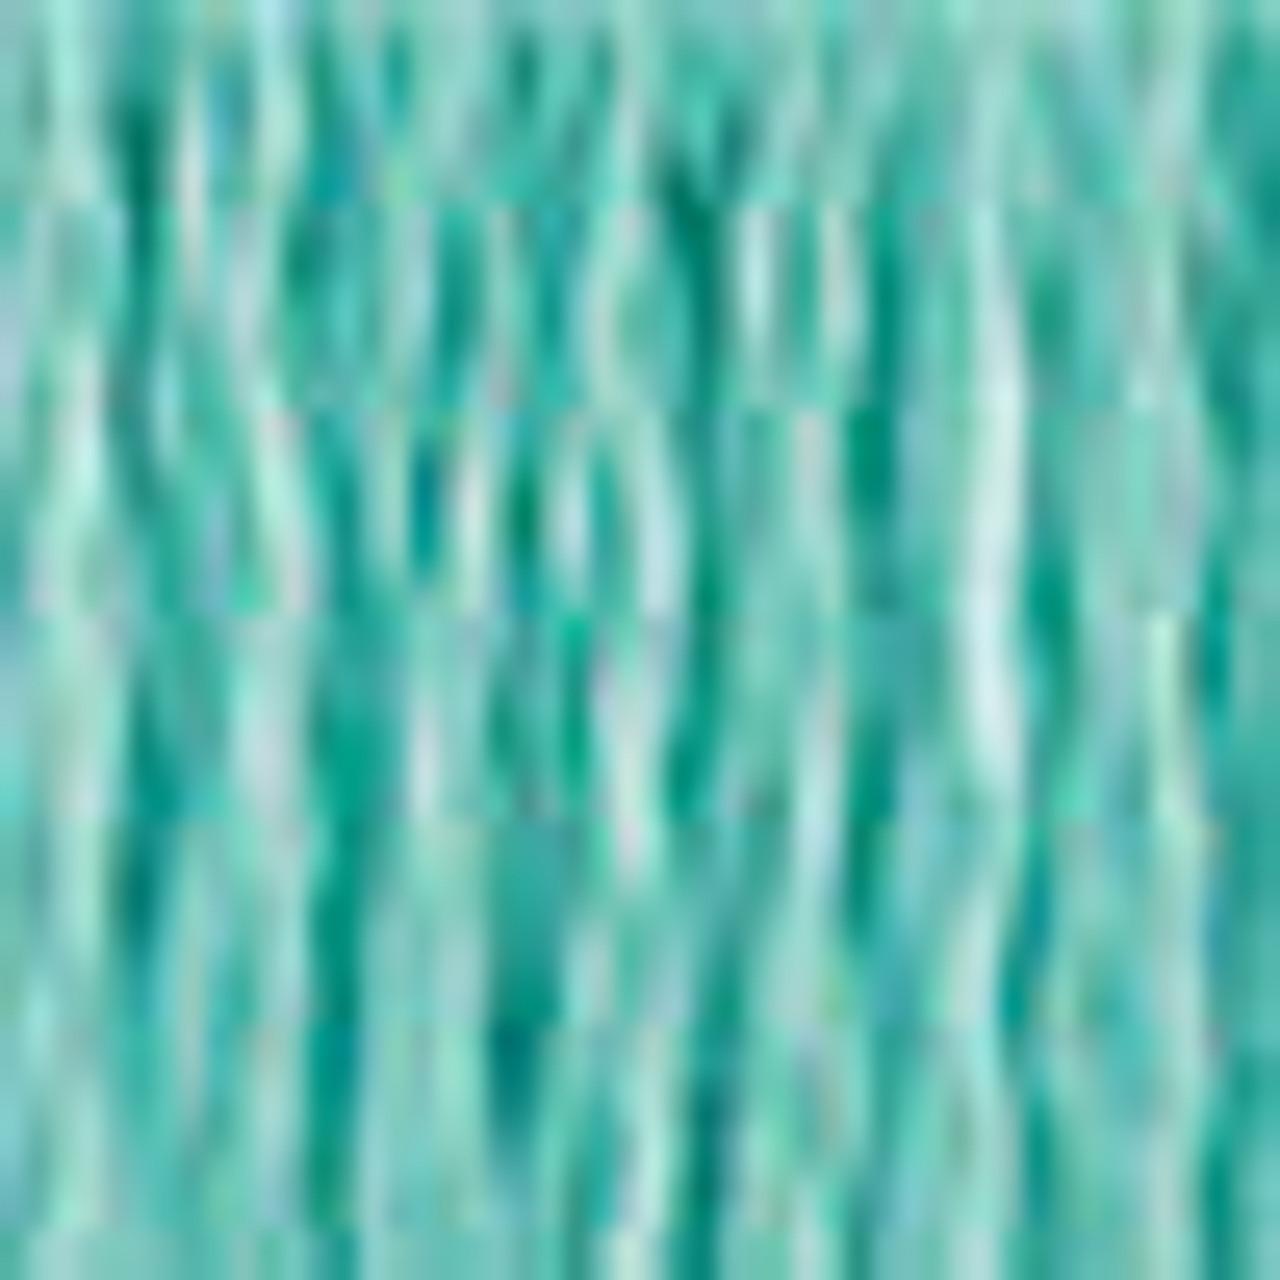 DMC #993 Very Light Aquamarine Floss / Thread